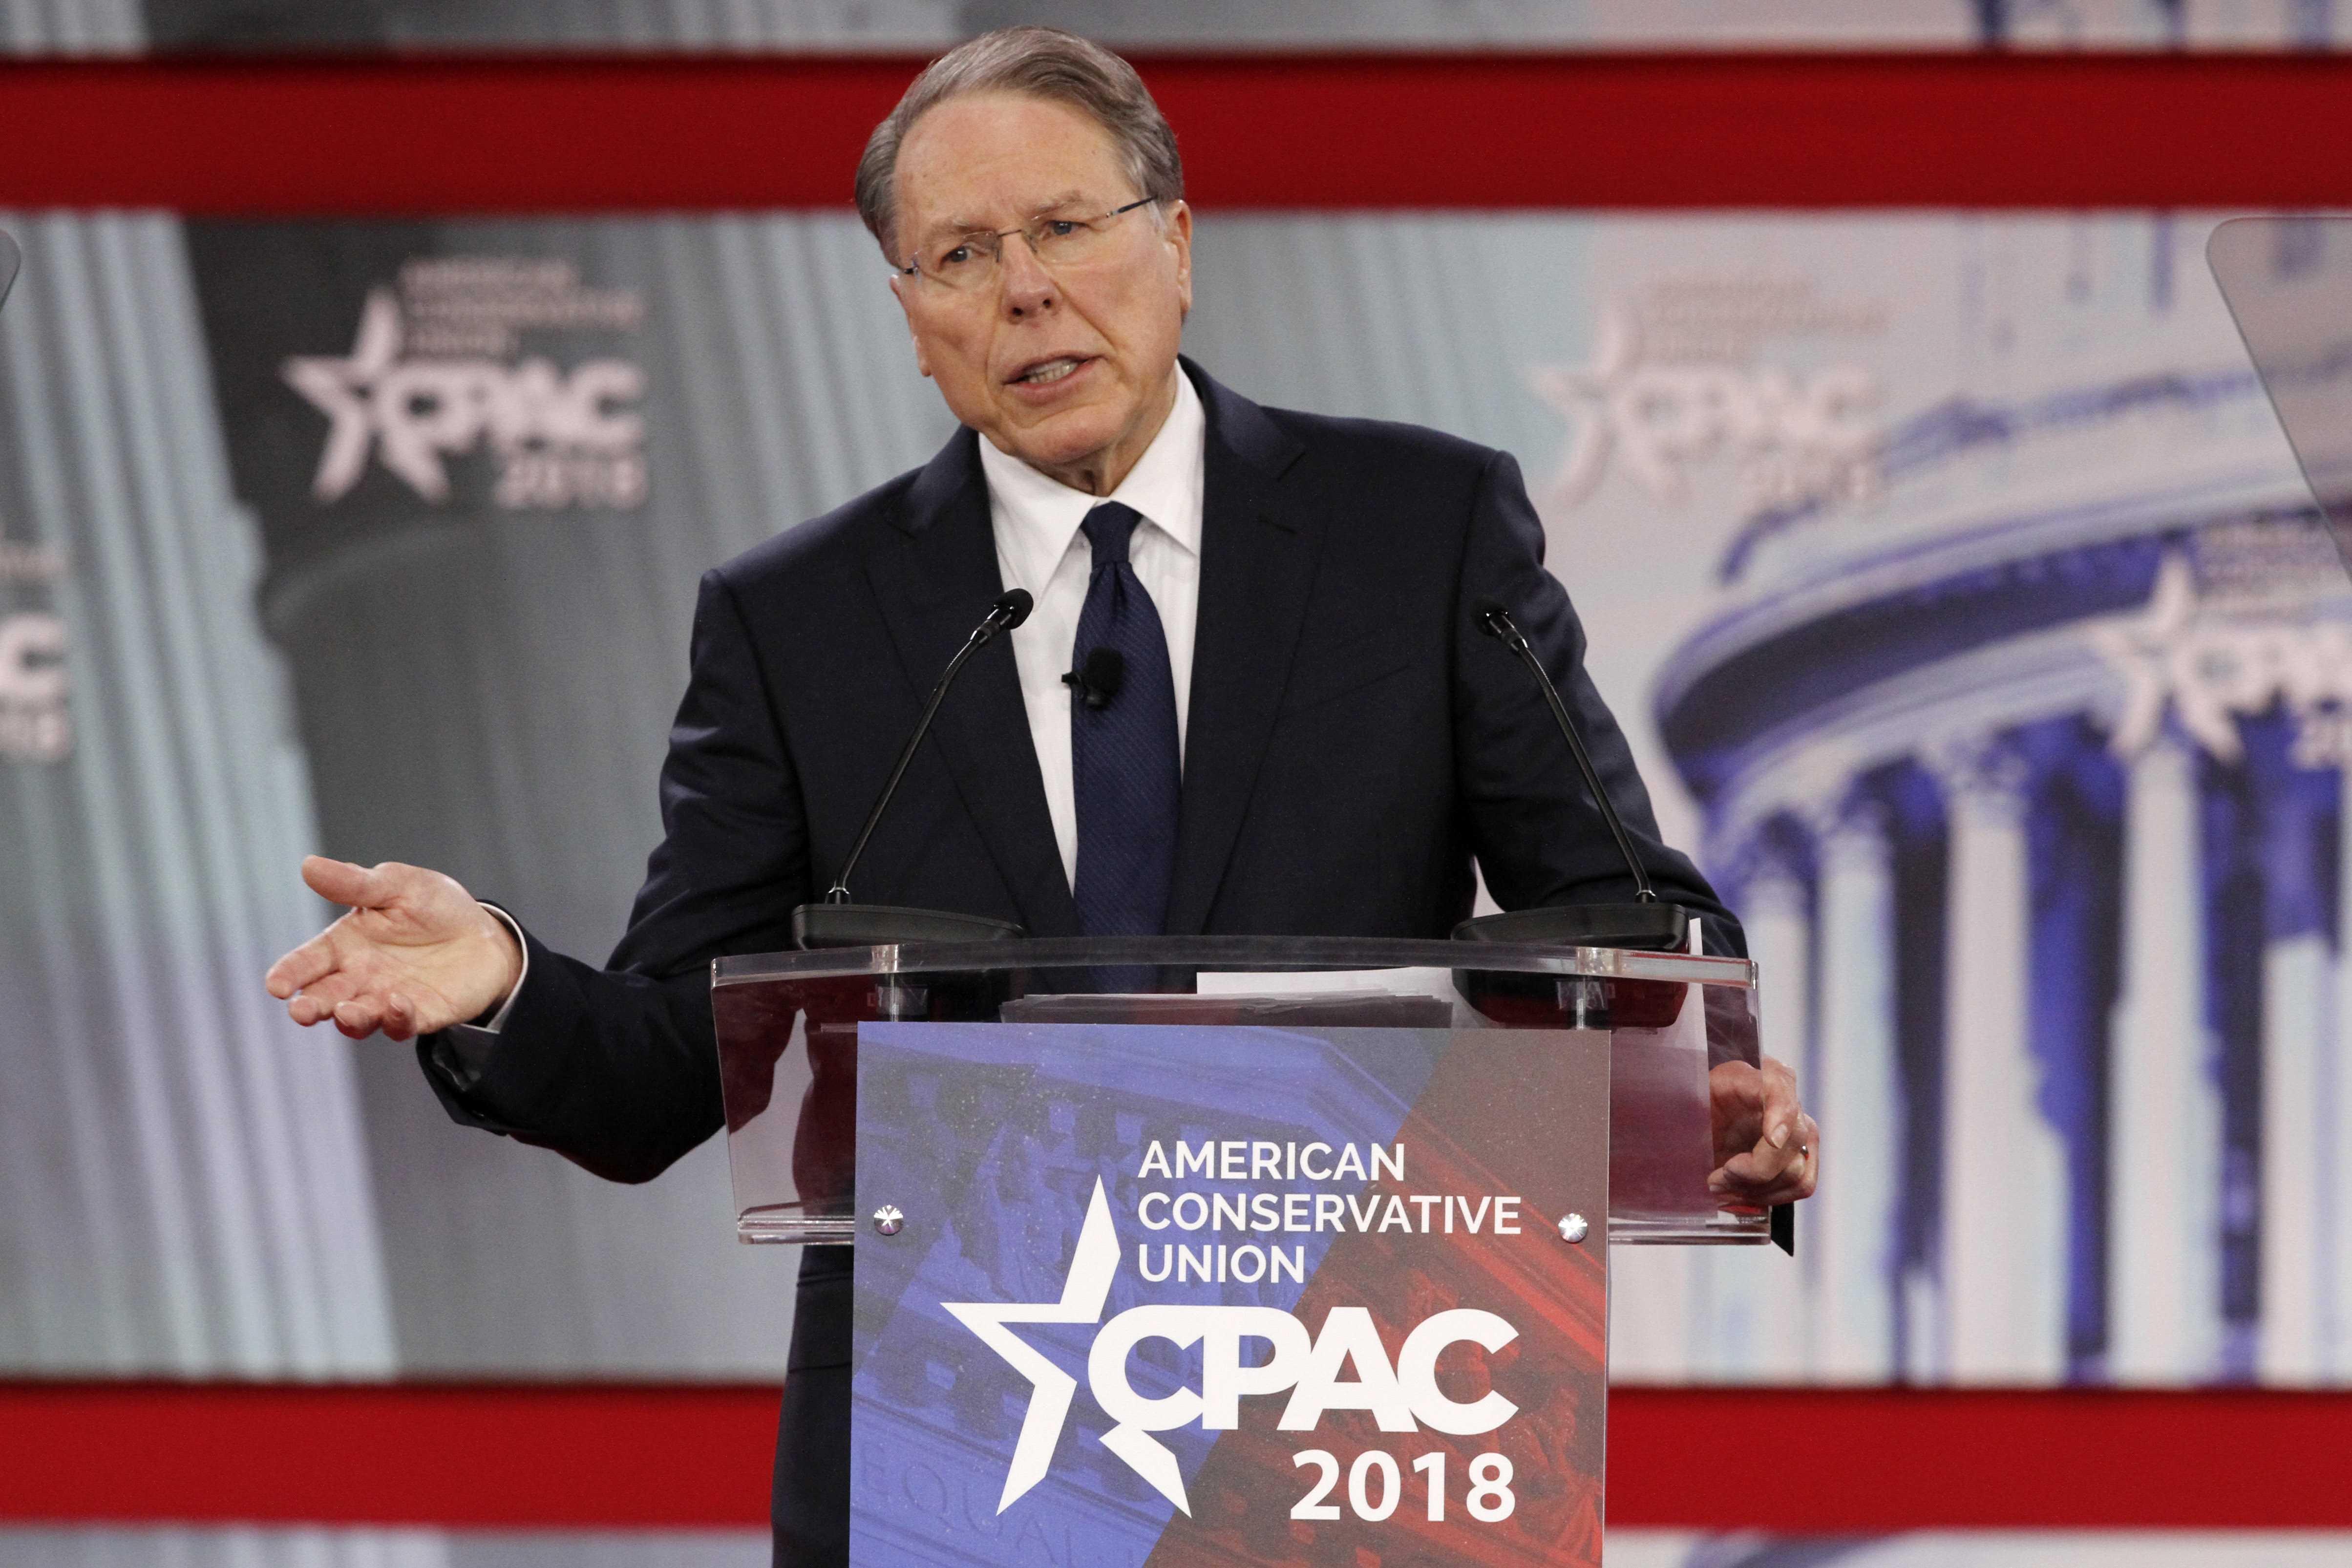 NRA's Wayne LaPierre hits Democrats, socialism in CPAC speech